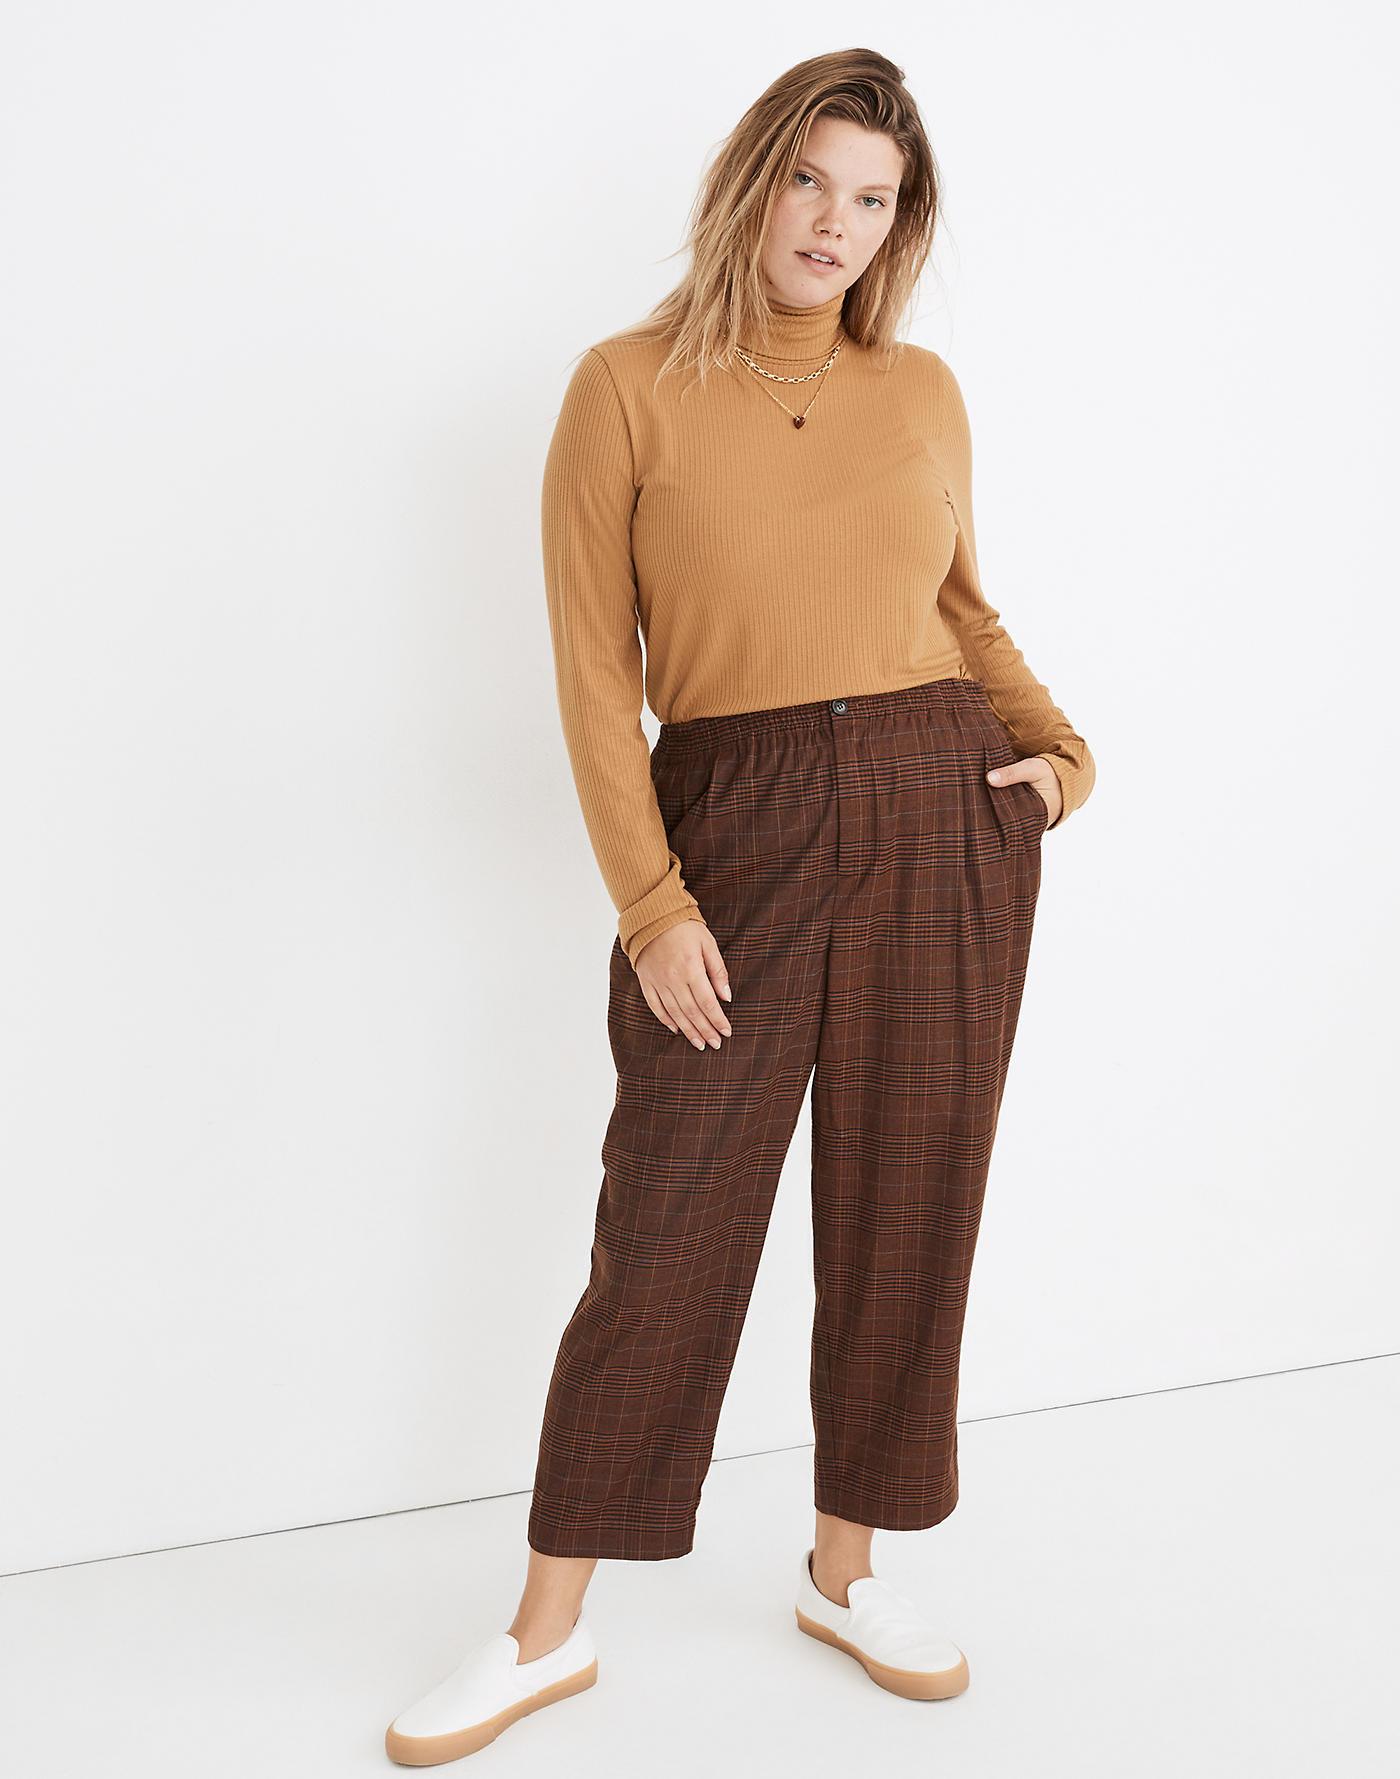 model wearing plaid pants